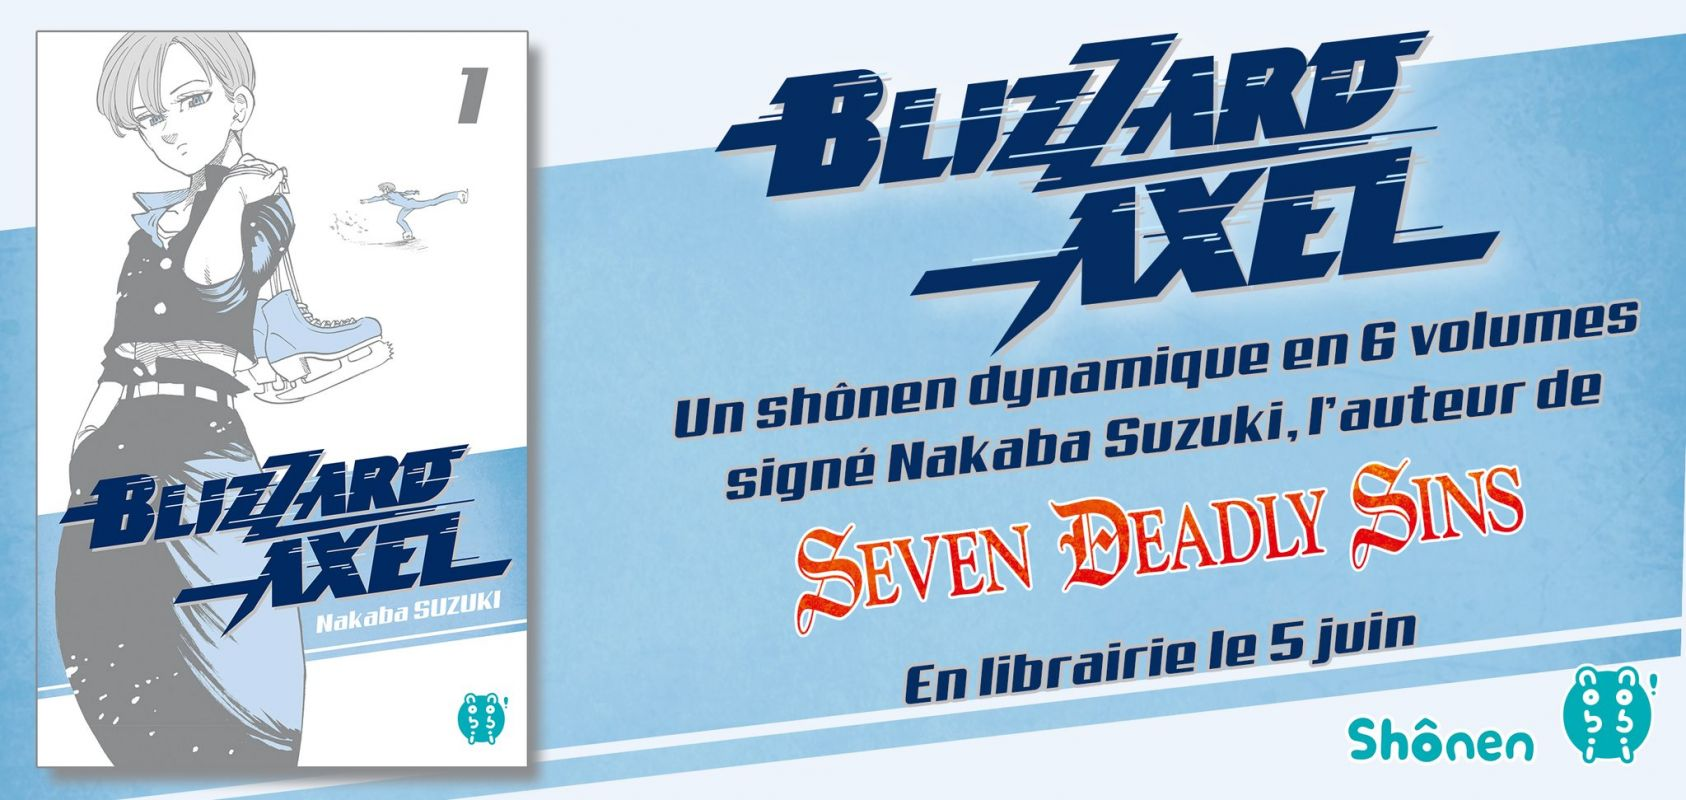 Blizzard Axel chez Nobi-Nobi